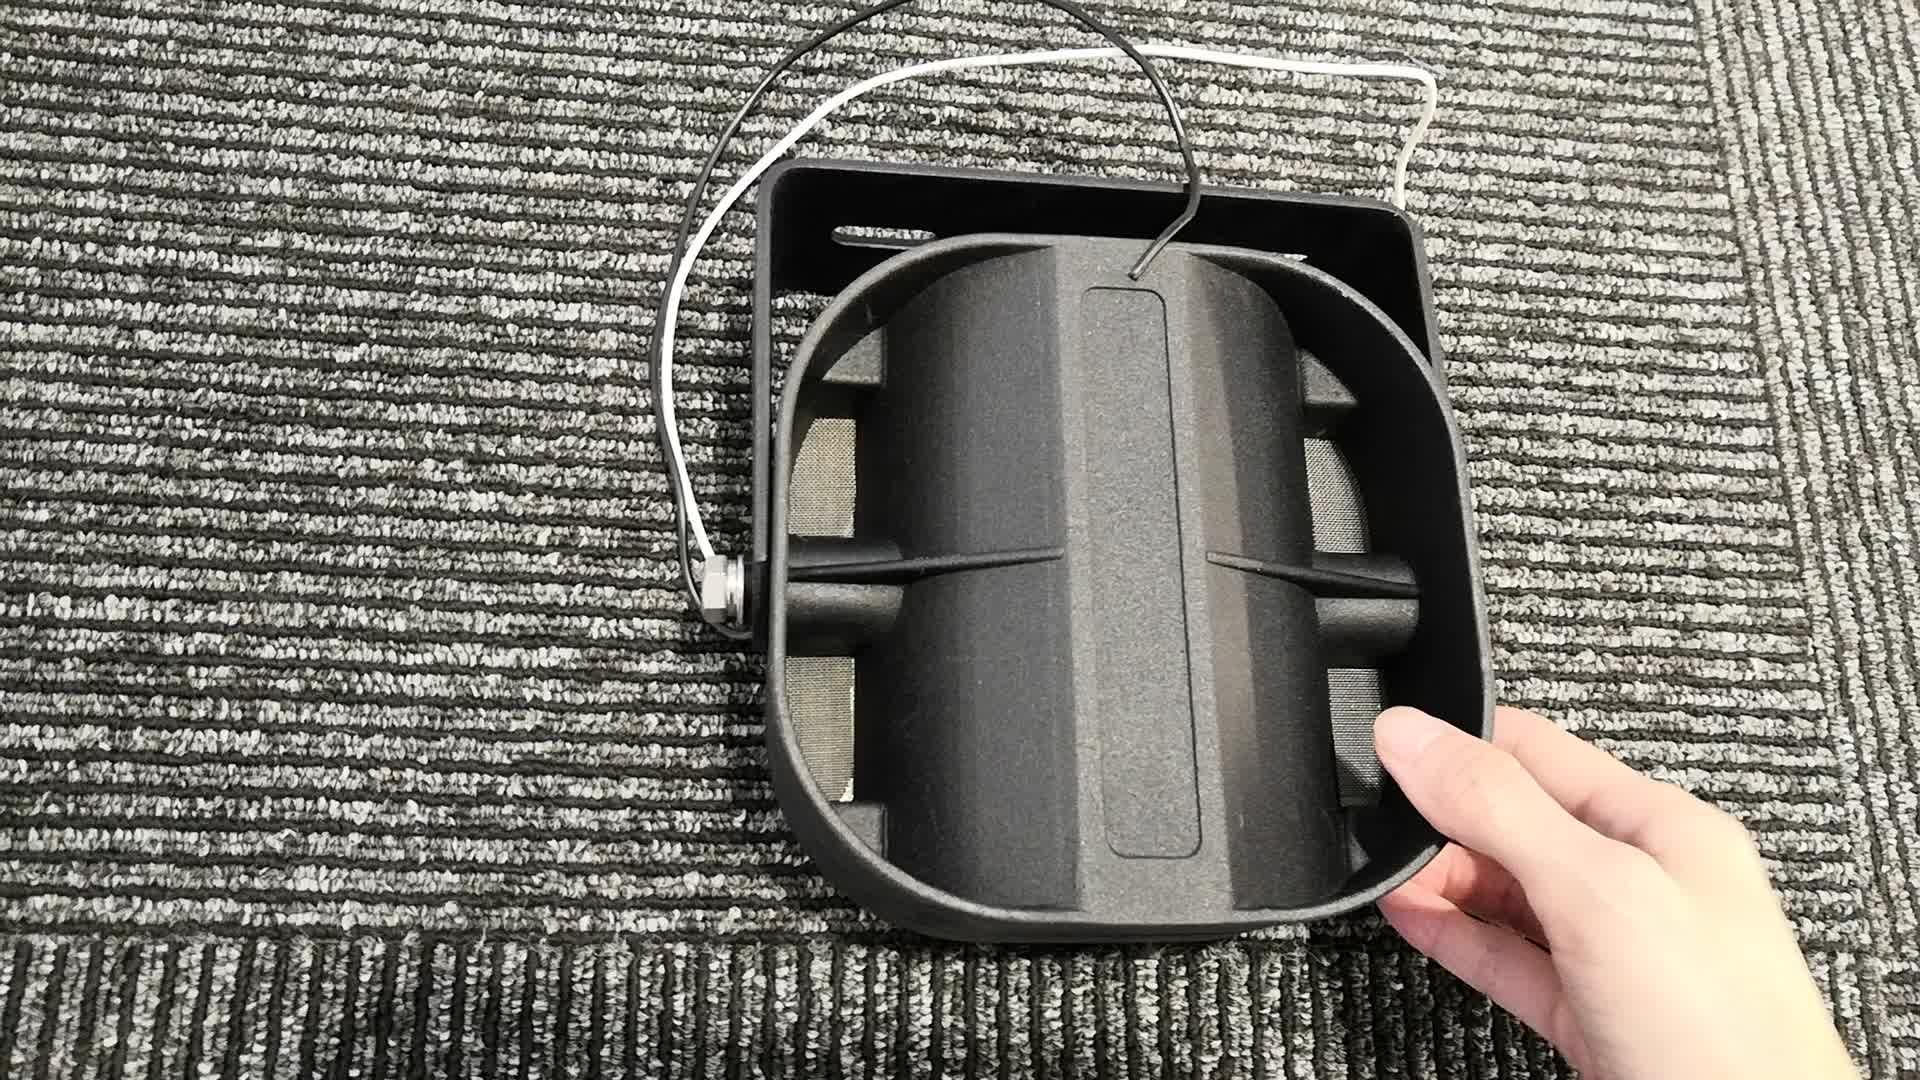 धातु सींग कवर कार एम्पलीफायर ऑडियो स्पीकर मोहिनी सींग